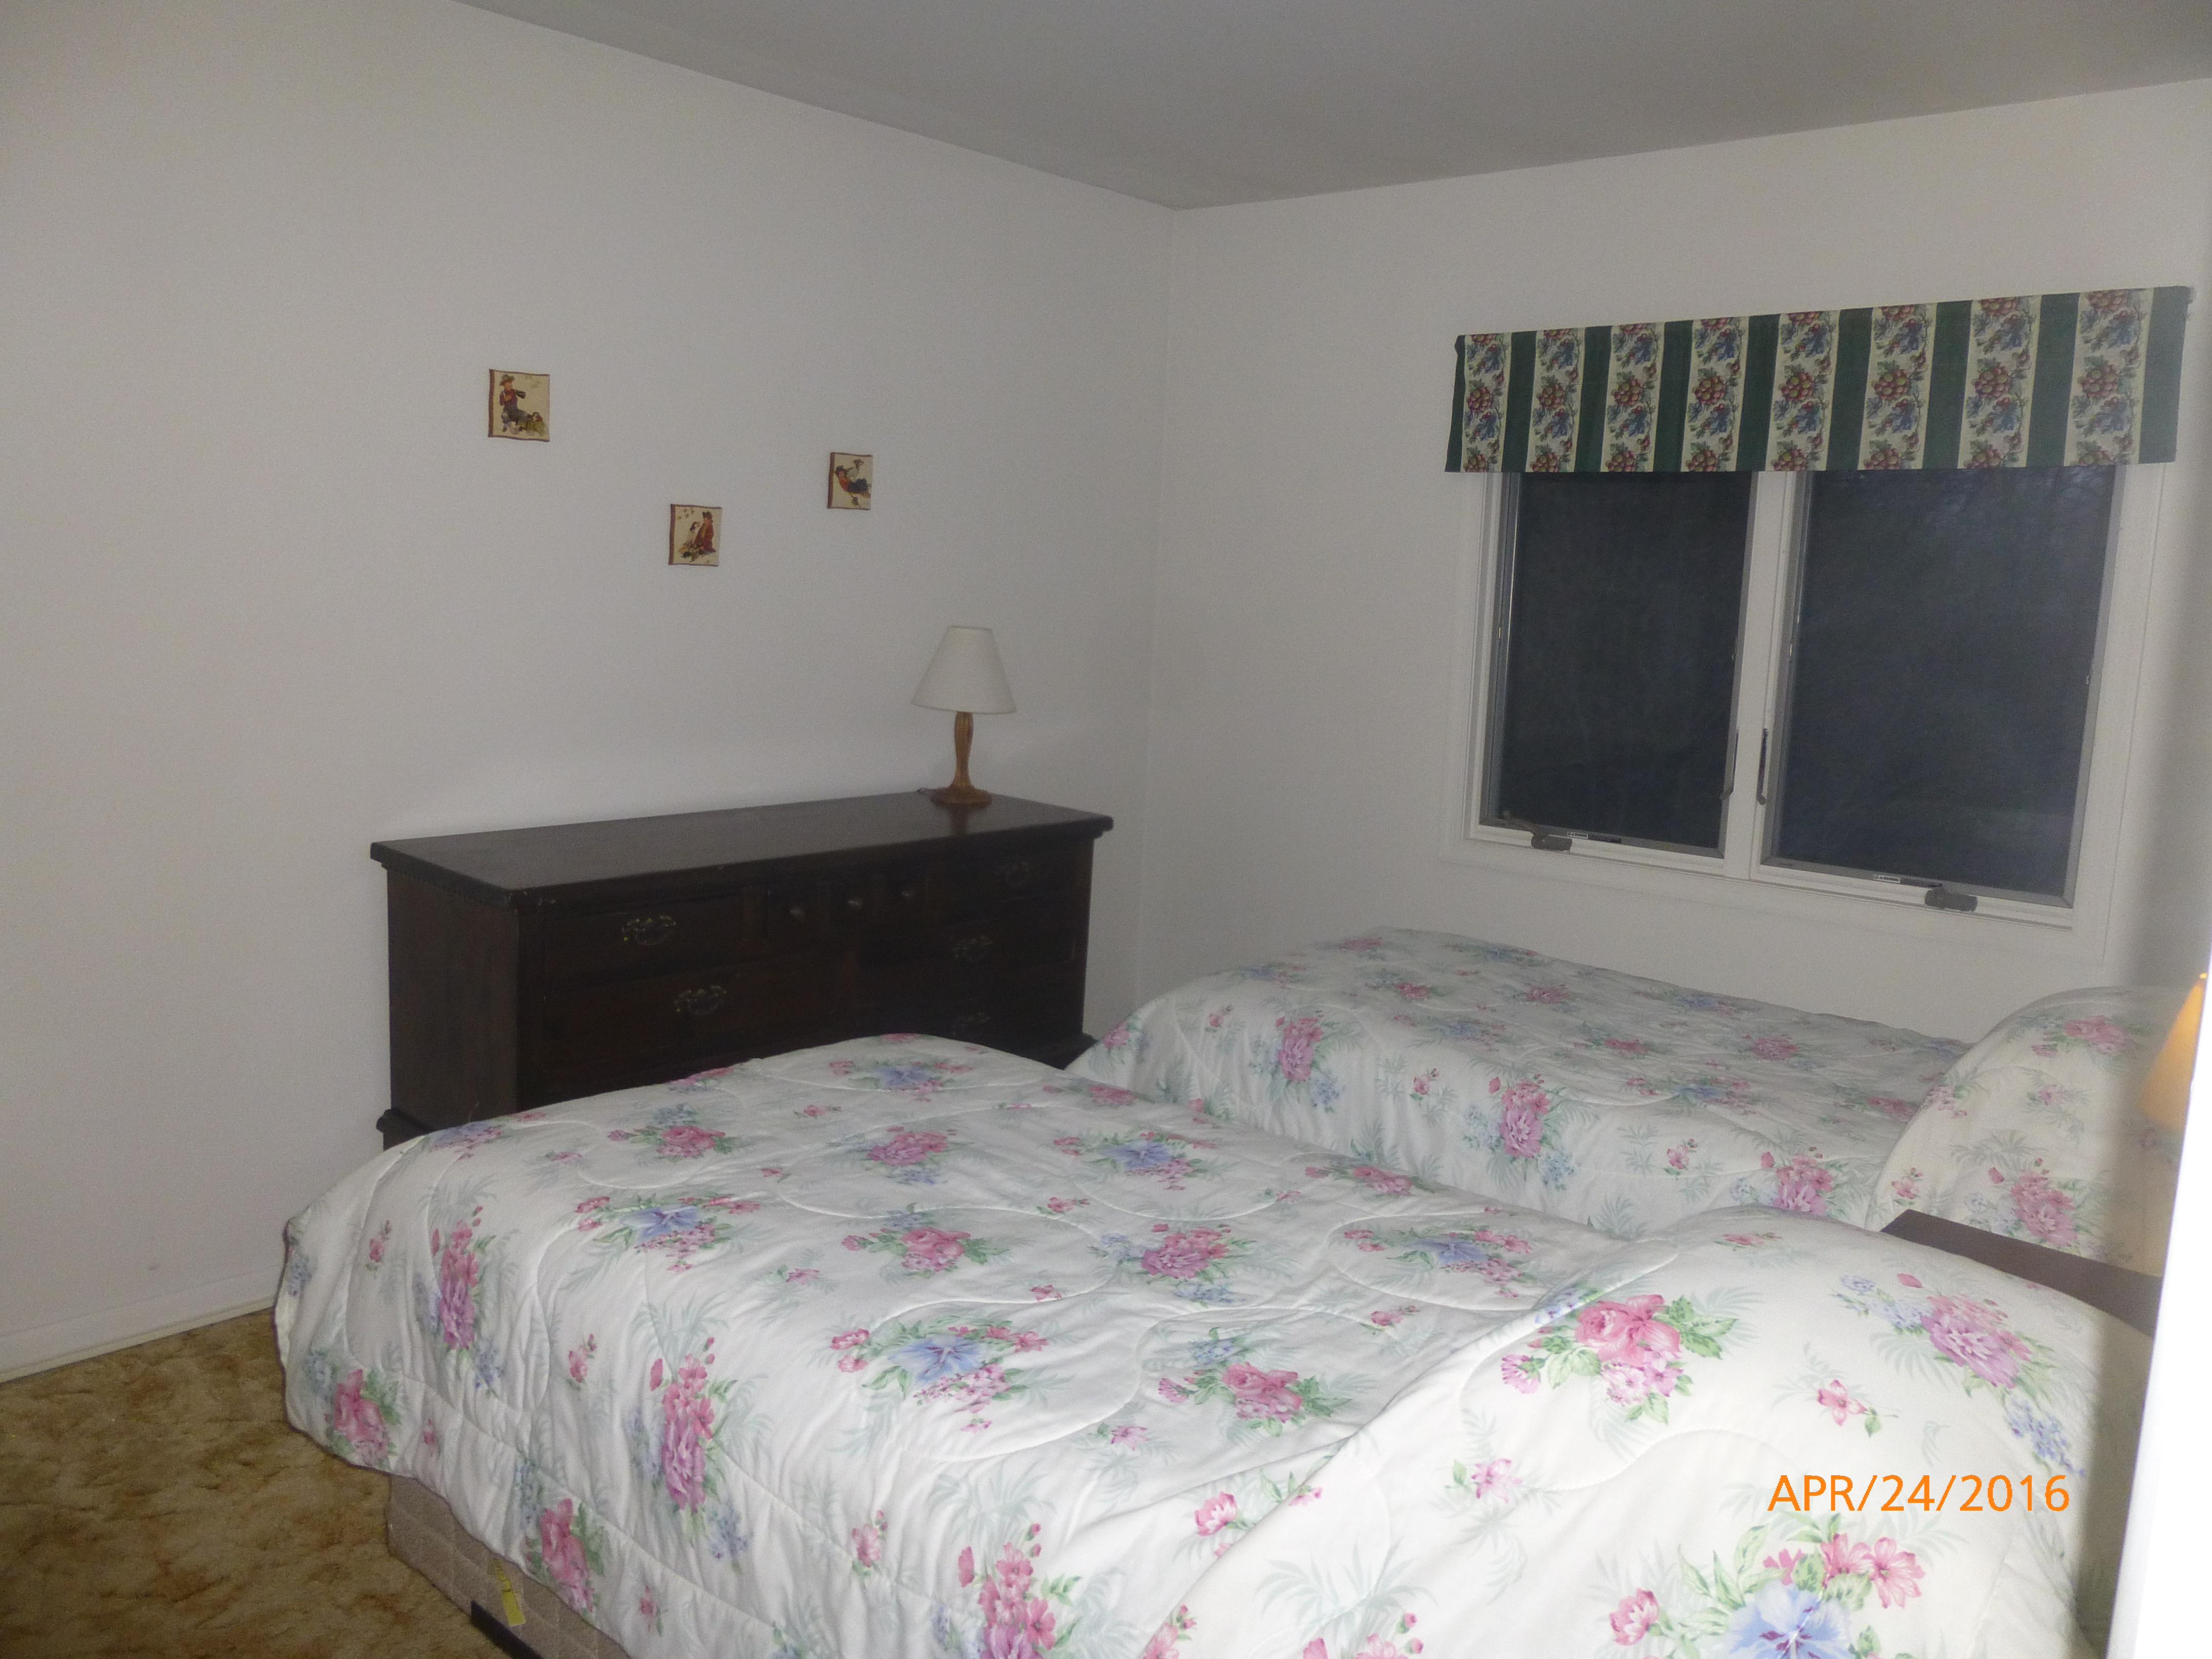 MRF Unit 10 Spare Bedroom